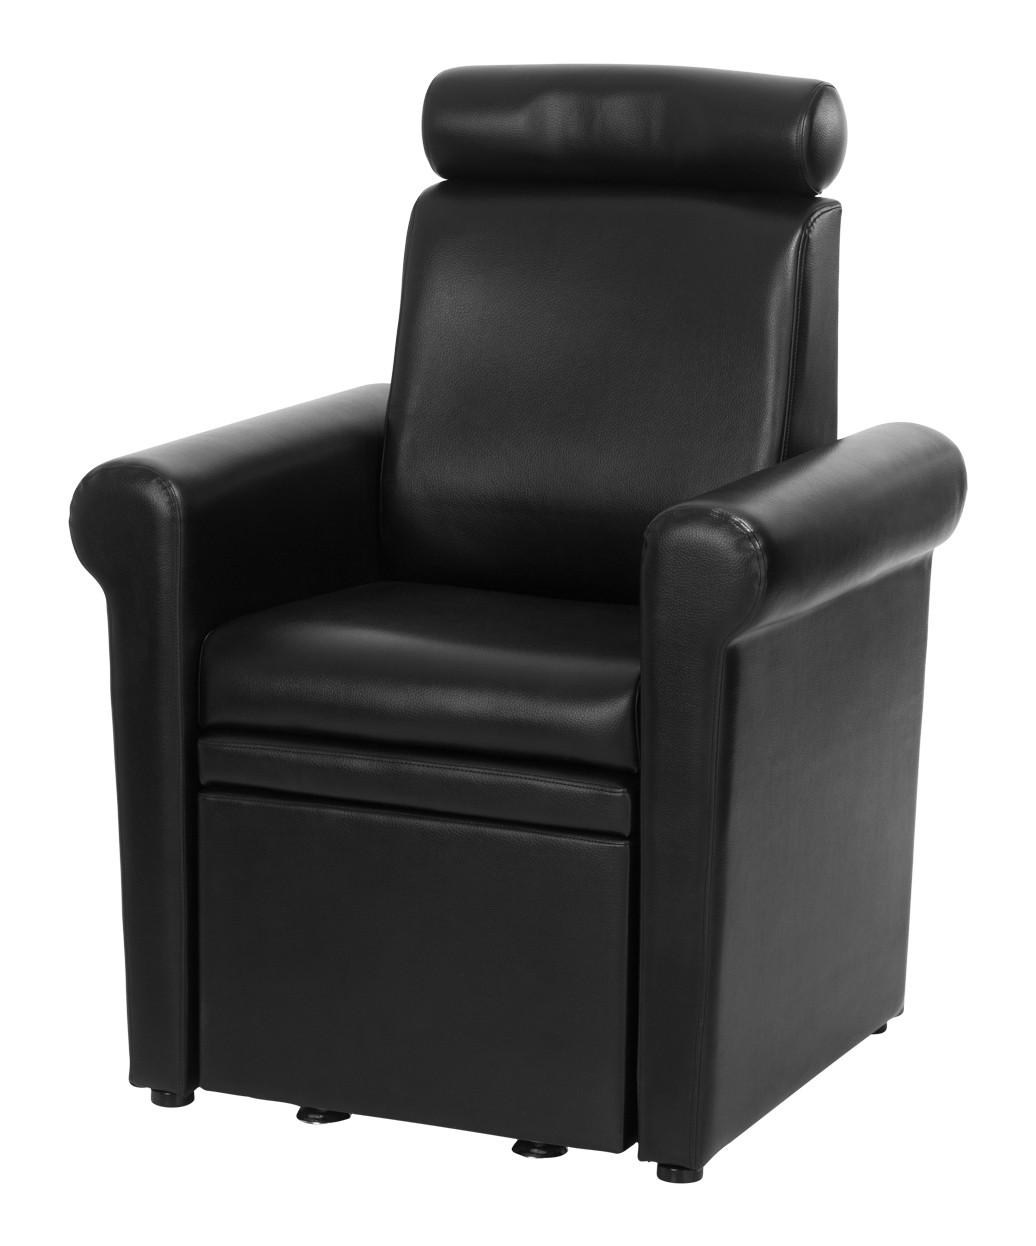 Mona Lisa Pedicure Chair. Black Black Black ...  sc 1 st  Buy-Rite Beauty & Pedicure Stool with Footrest: Mona Lisa Pedicure Chair islam-shia.org